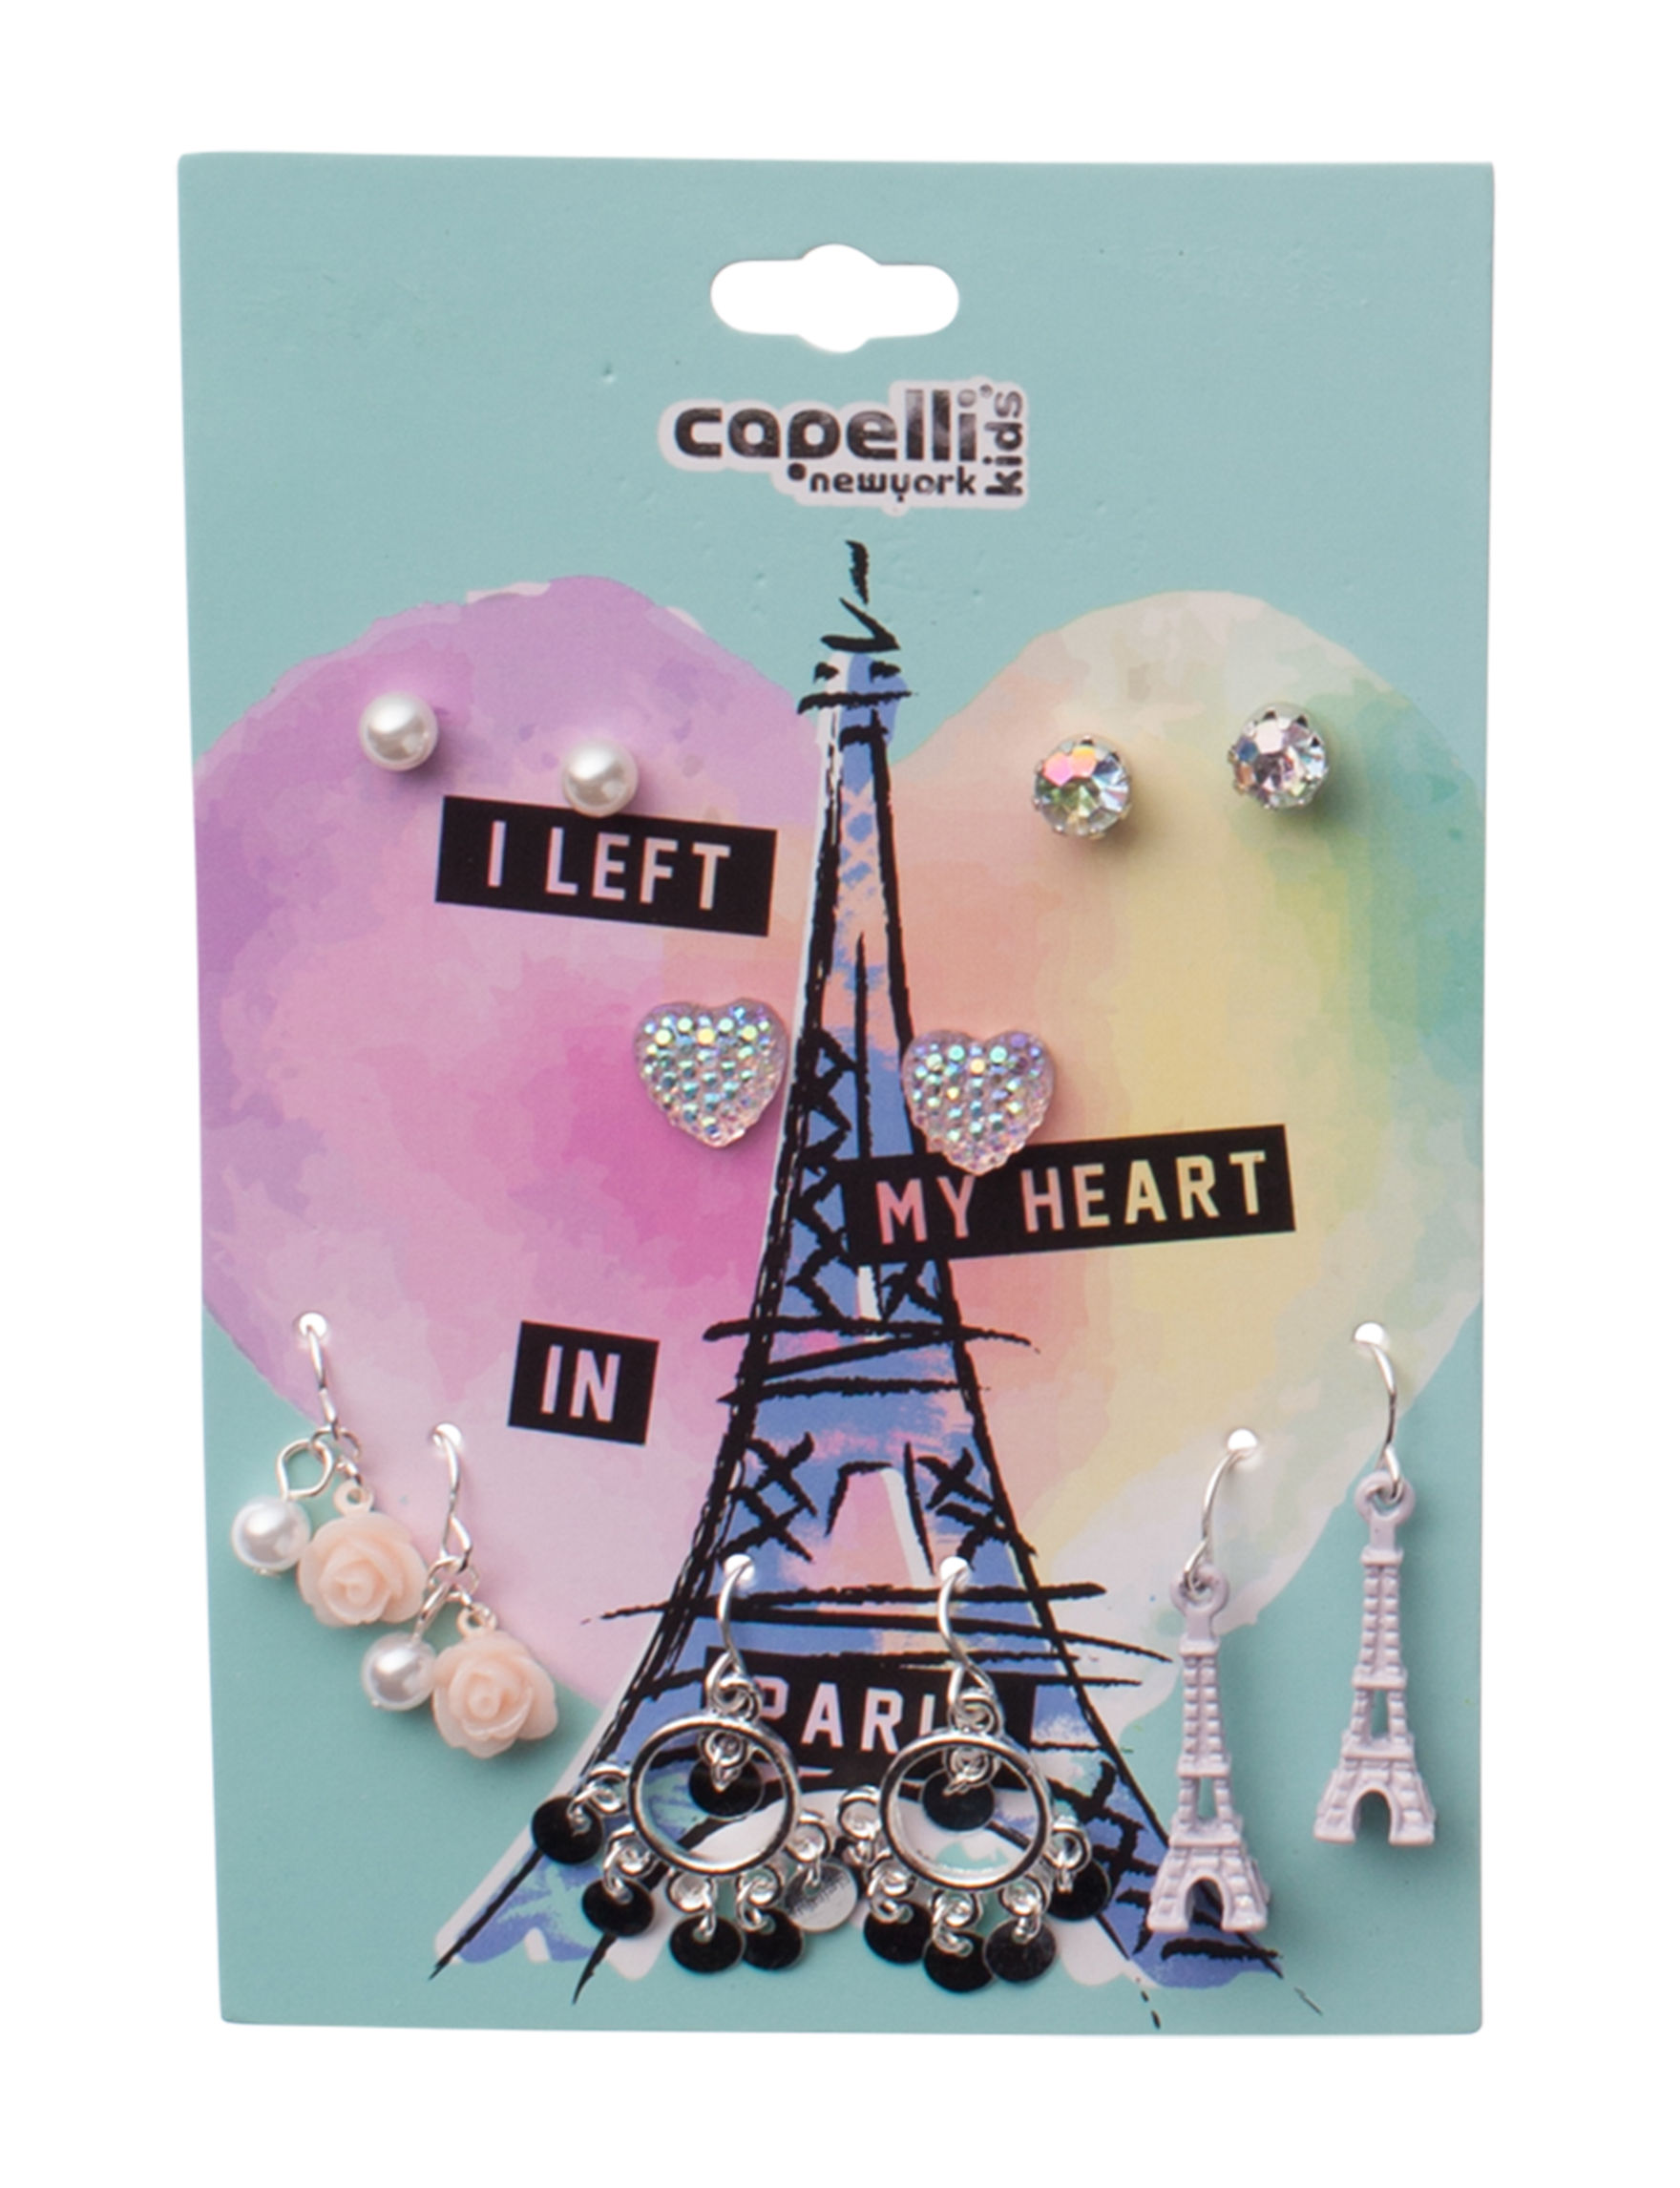 Capelli Silver / Crystal